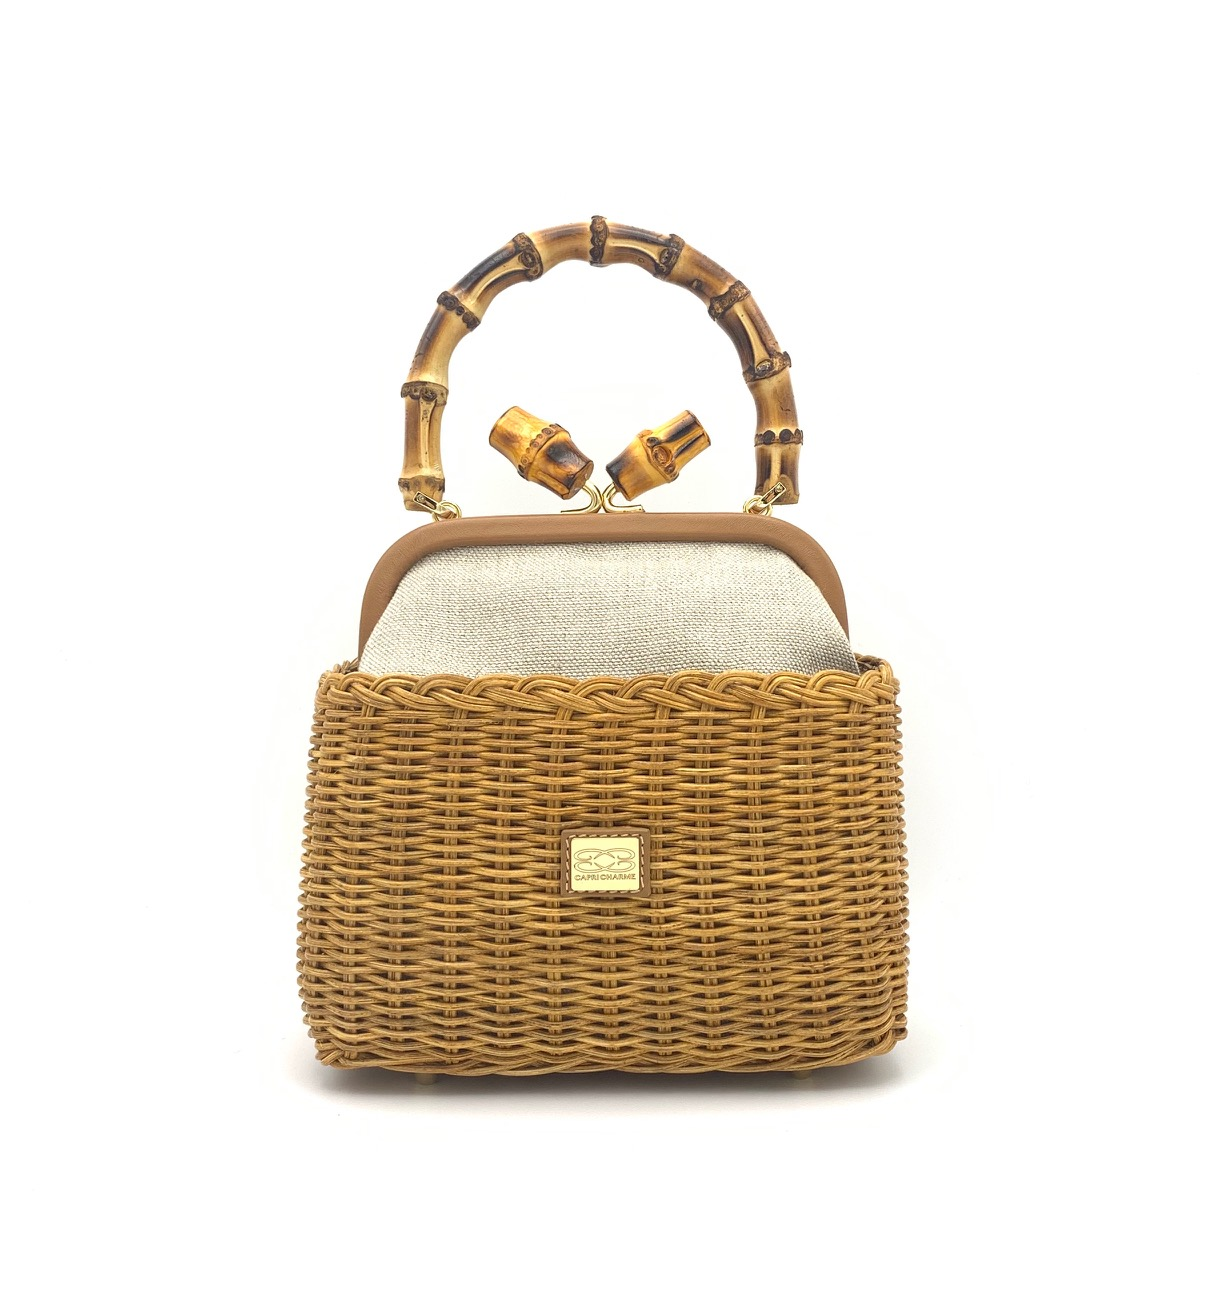 Phuket basket in natural wicker/honey